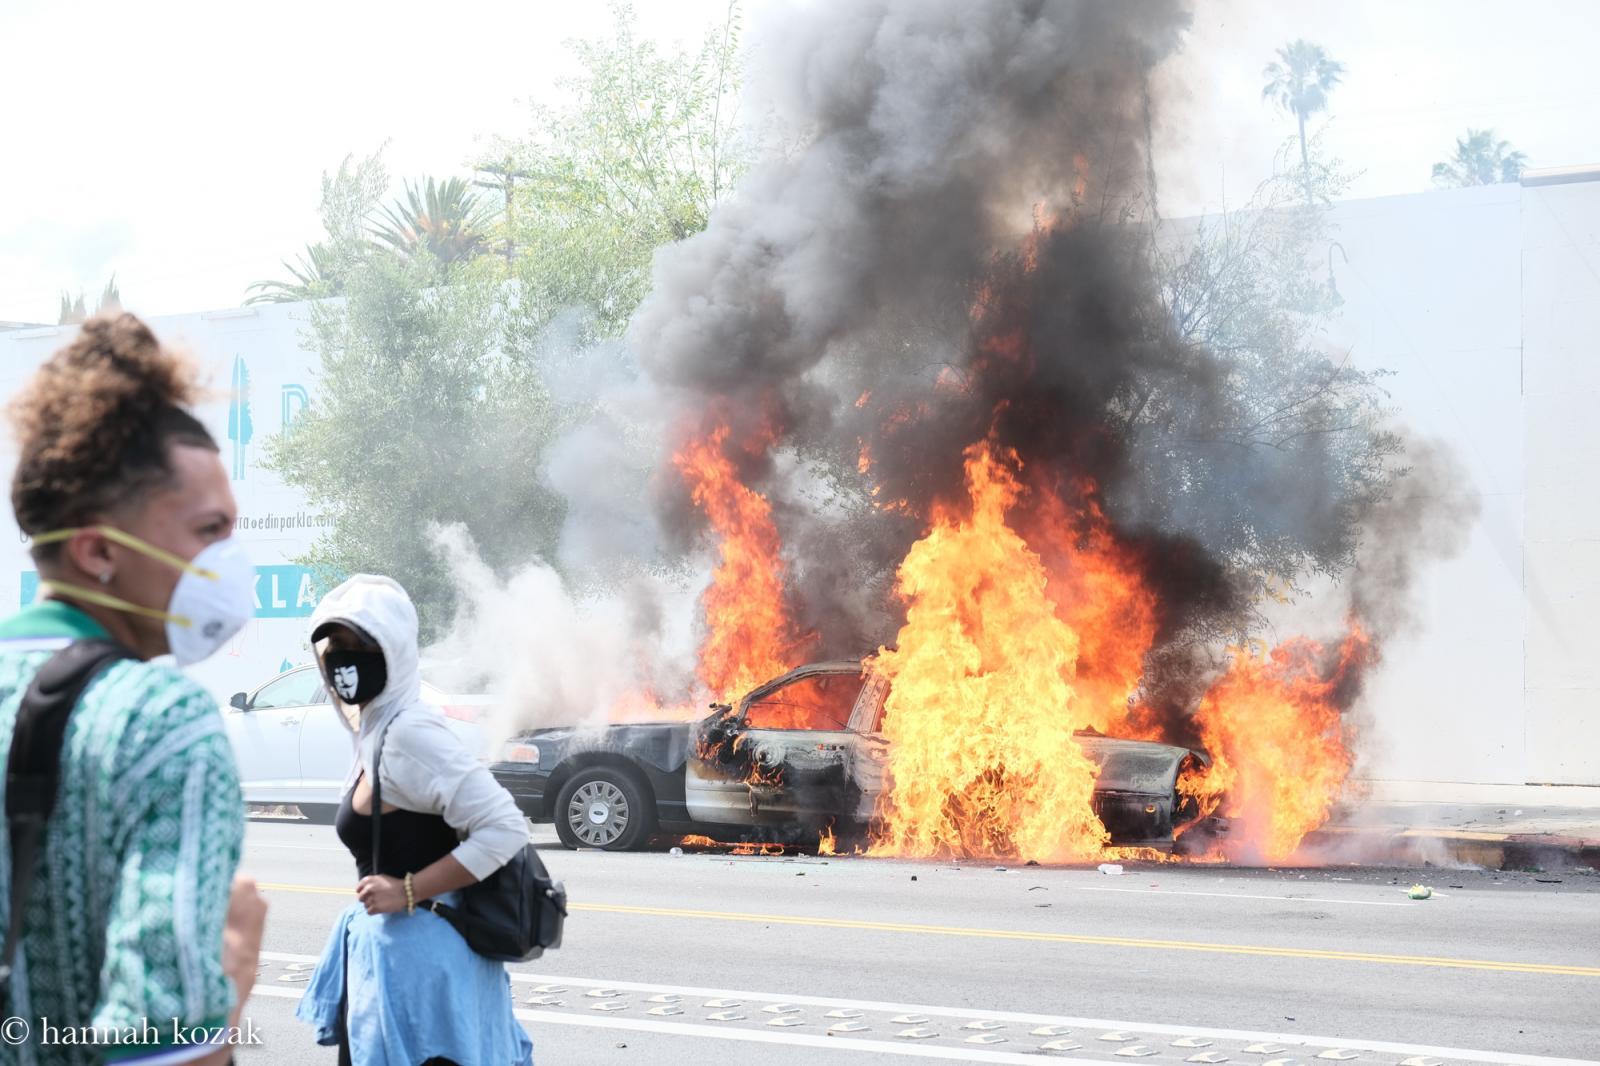 Photography image - Loading Hannah_Kozak_LA-Protest-29-May-2020_May-30_-2020_DSCF9837.jpg